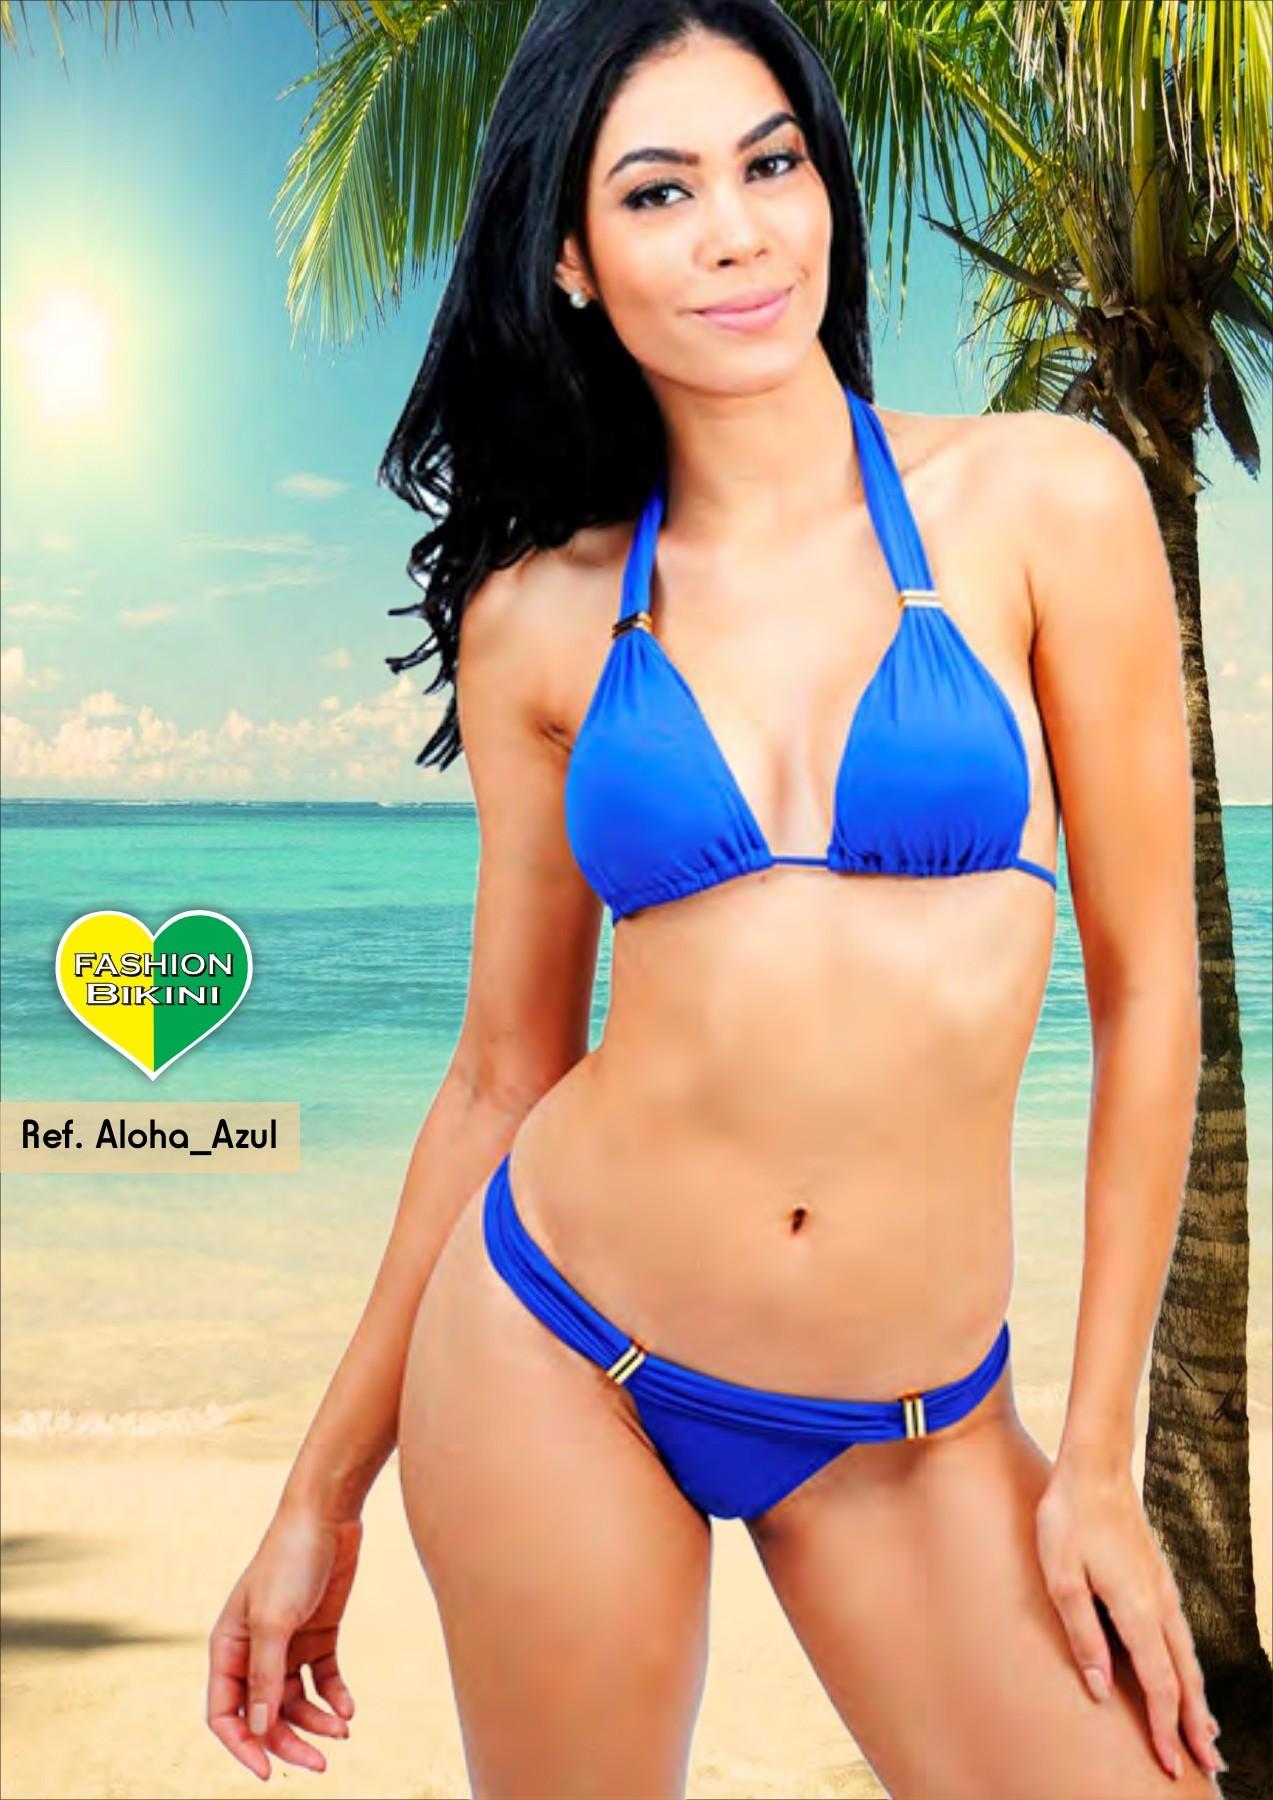 89e00b94f Fashion Bikini - biquini, moda praia, loja de biquini... - Catálogo